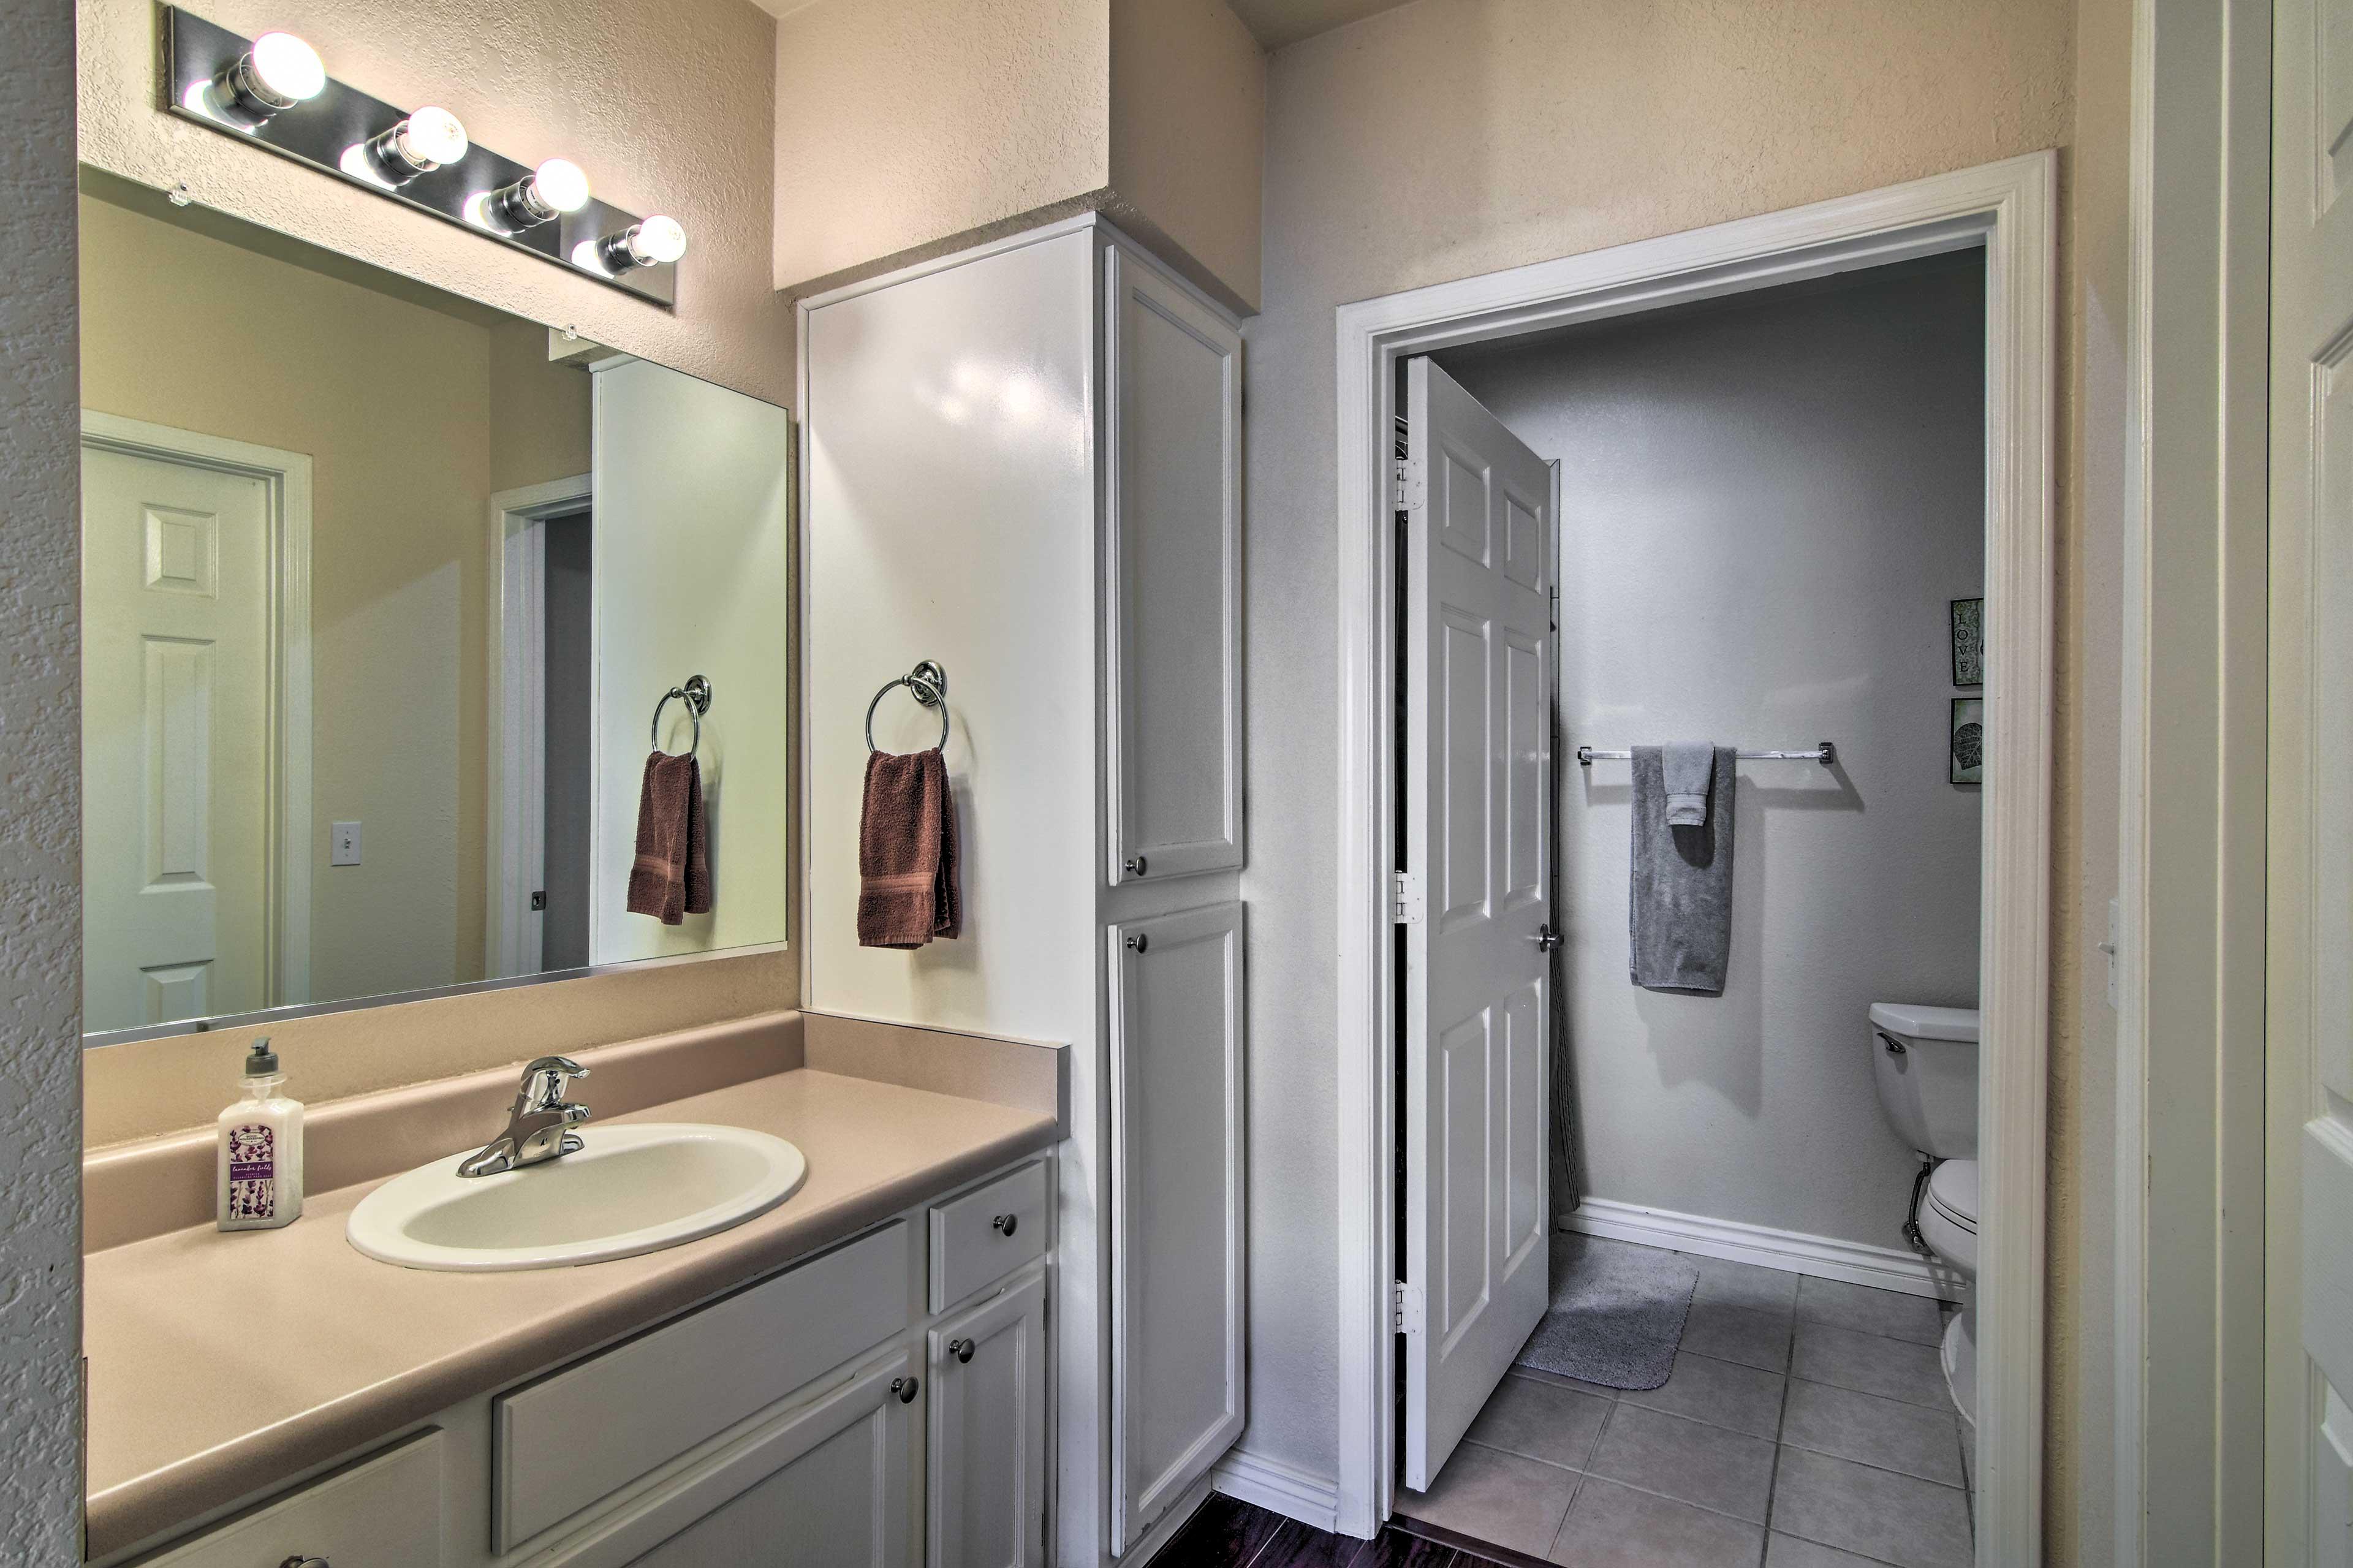 The en-suite bathroom has ample storage space.